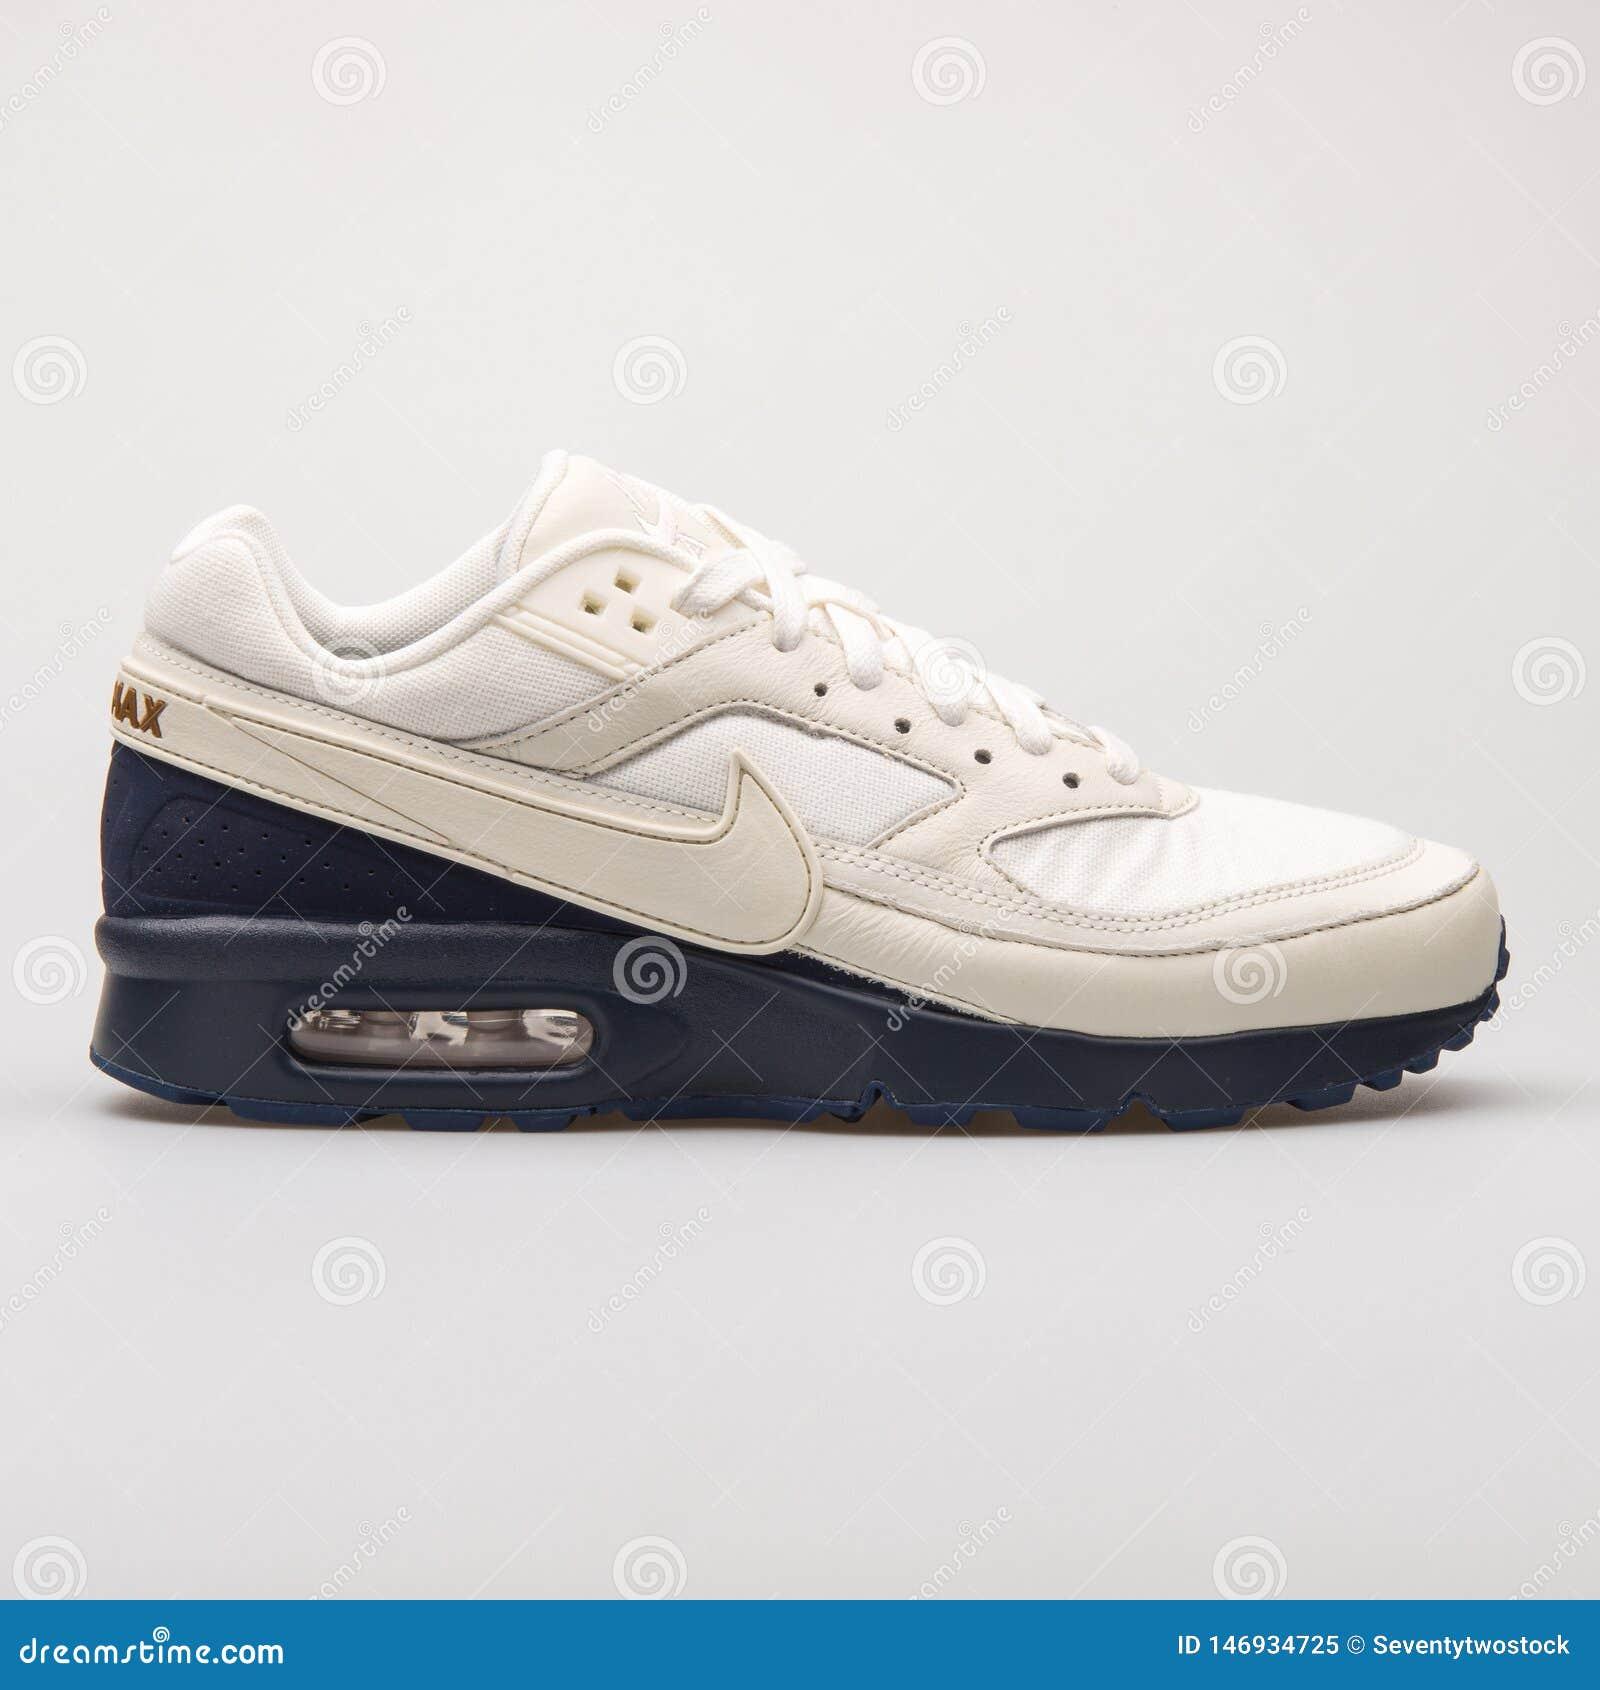 Nike Air Max BW Premium White And Navy Blue Sneaker